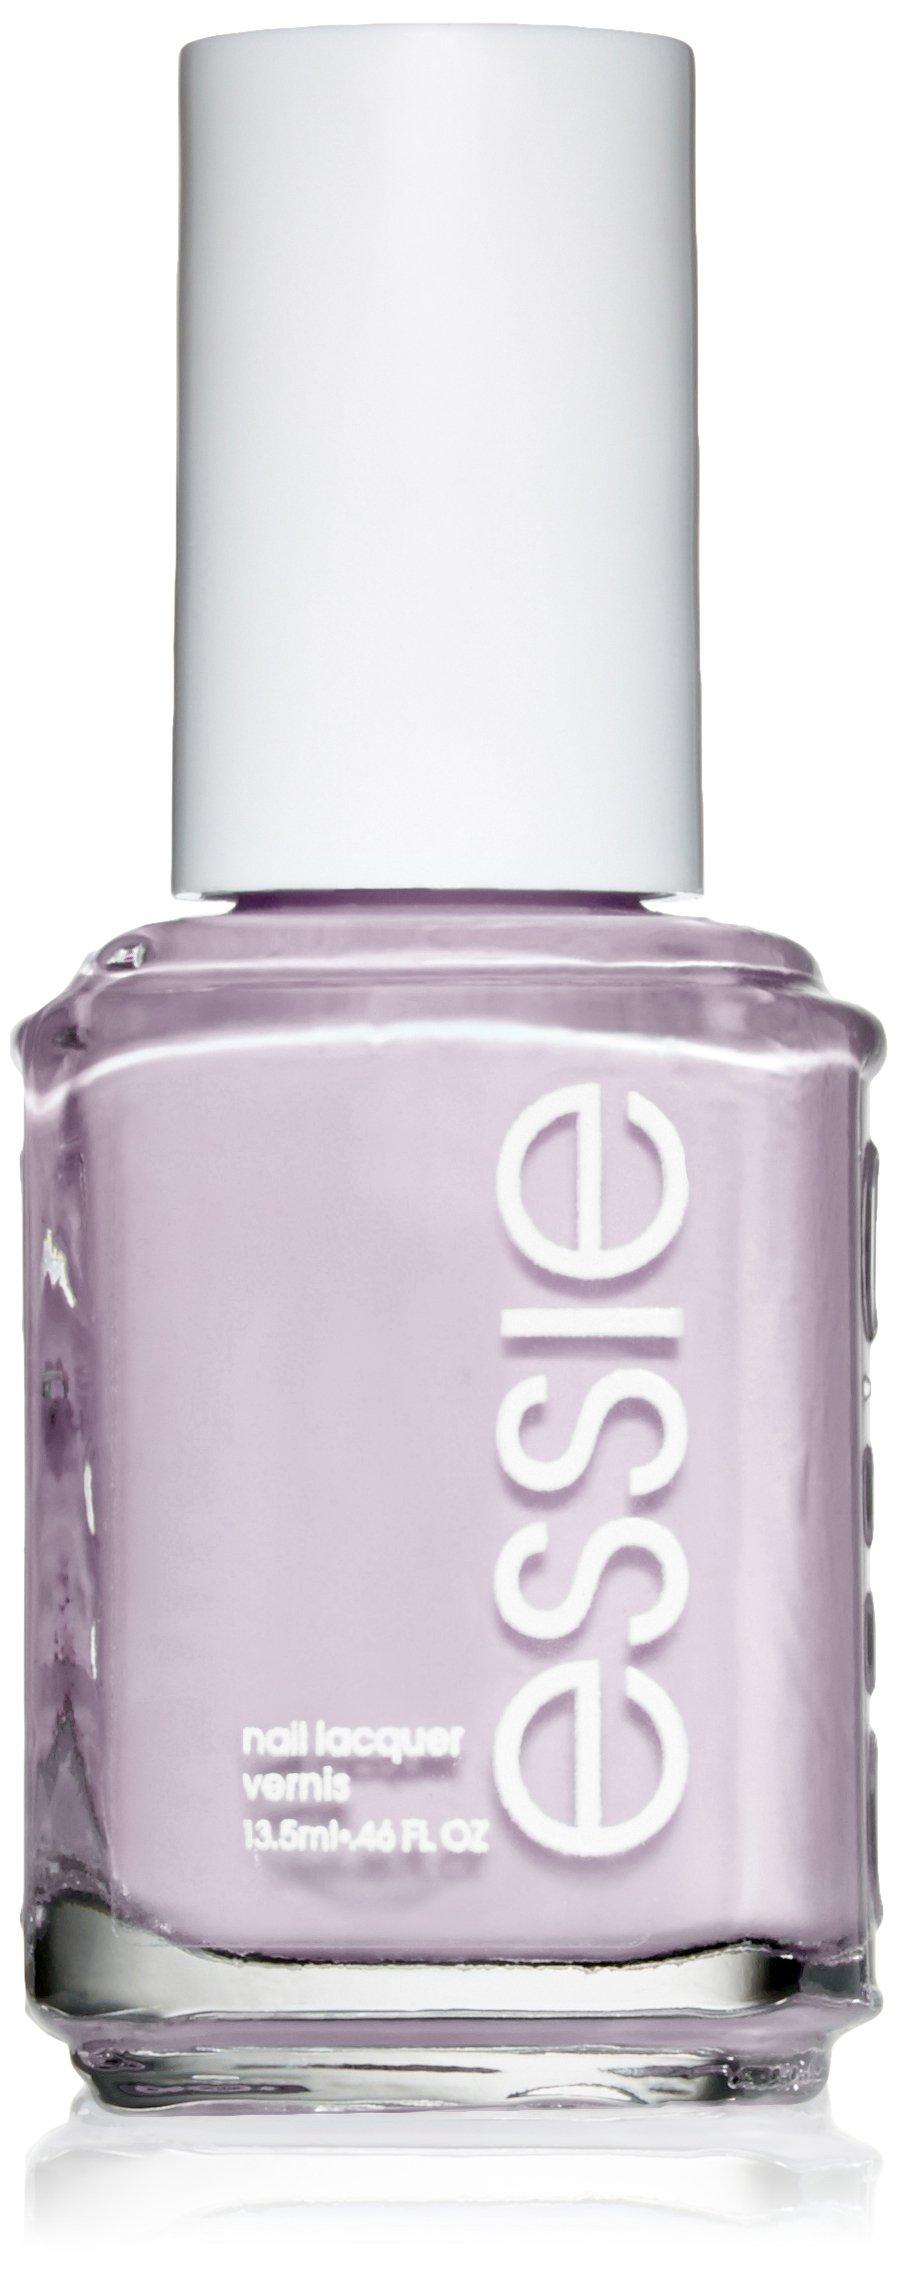 Amazon.com : essie nail polish, ballet slippers, pink nail ...